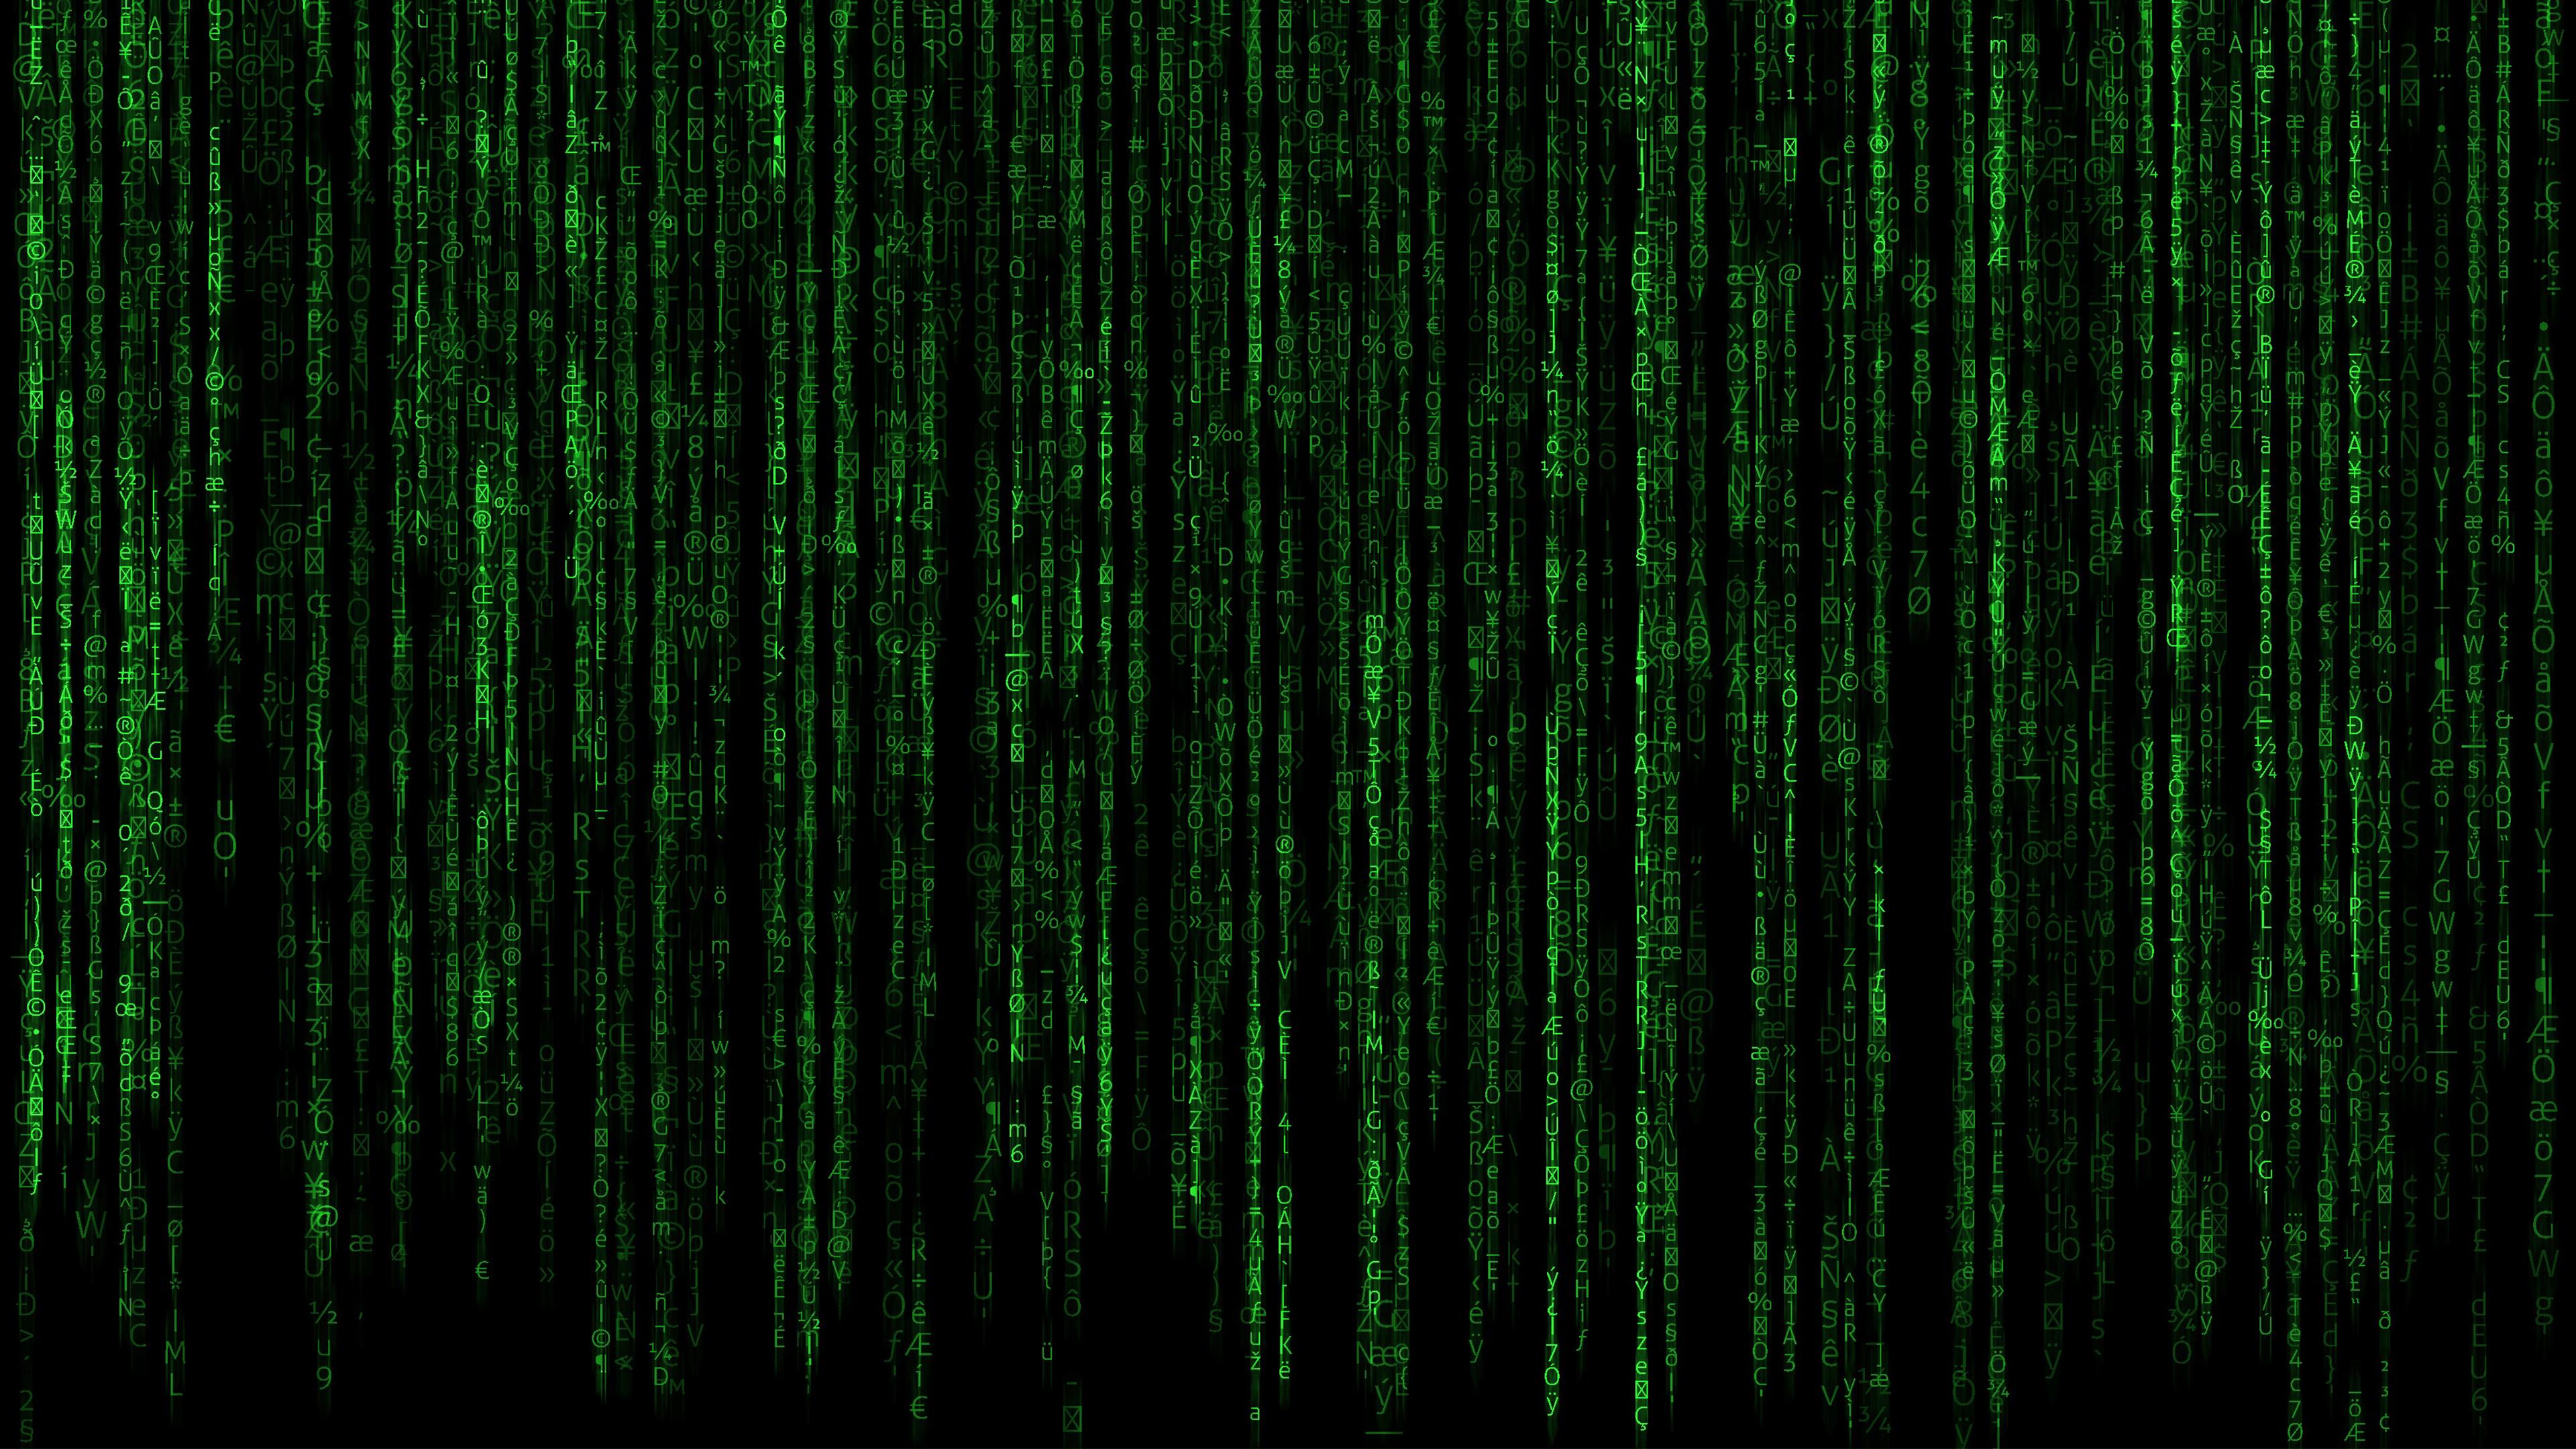 4k Matrix Wallpapers Top Free 4k Matrix Backgrounds Wallpaperaccess